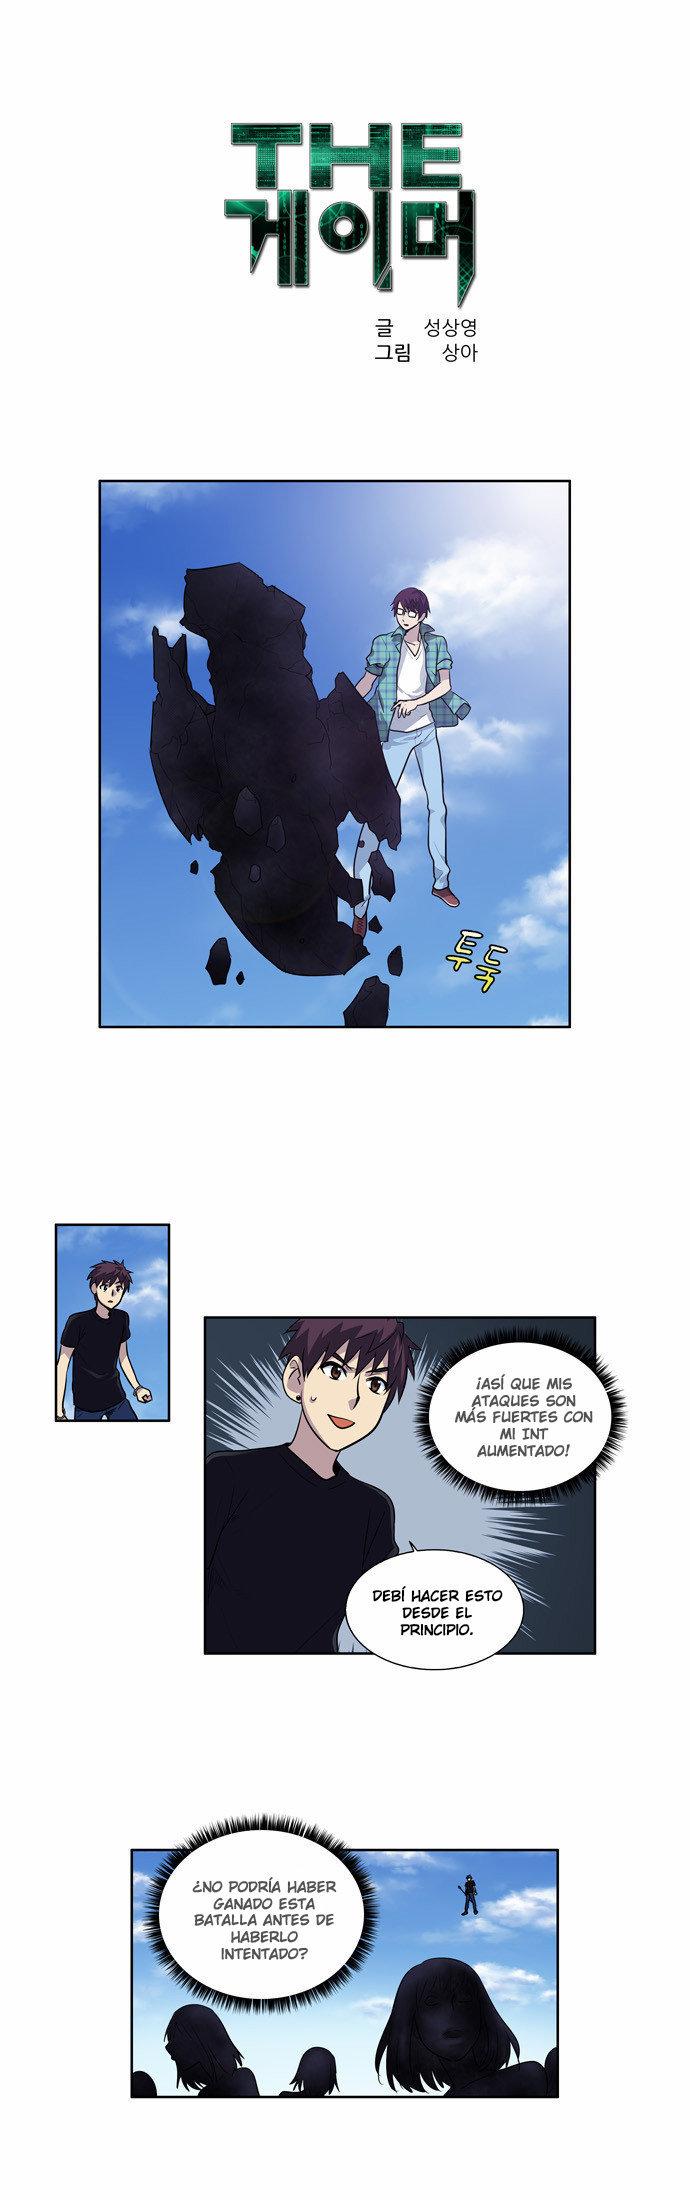 http://c5.ninemanga.com/es_manga/61/1725/442376/54caf3f6167335a6daed0946b2d4c5d5.jpg Page 2